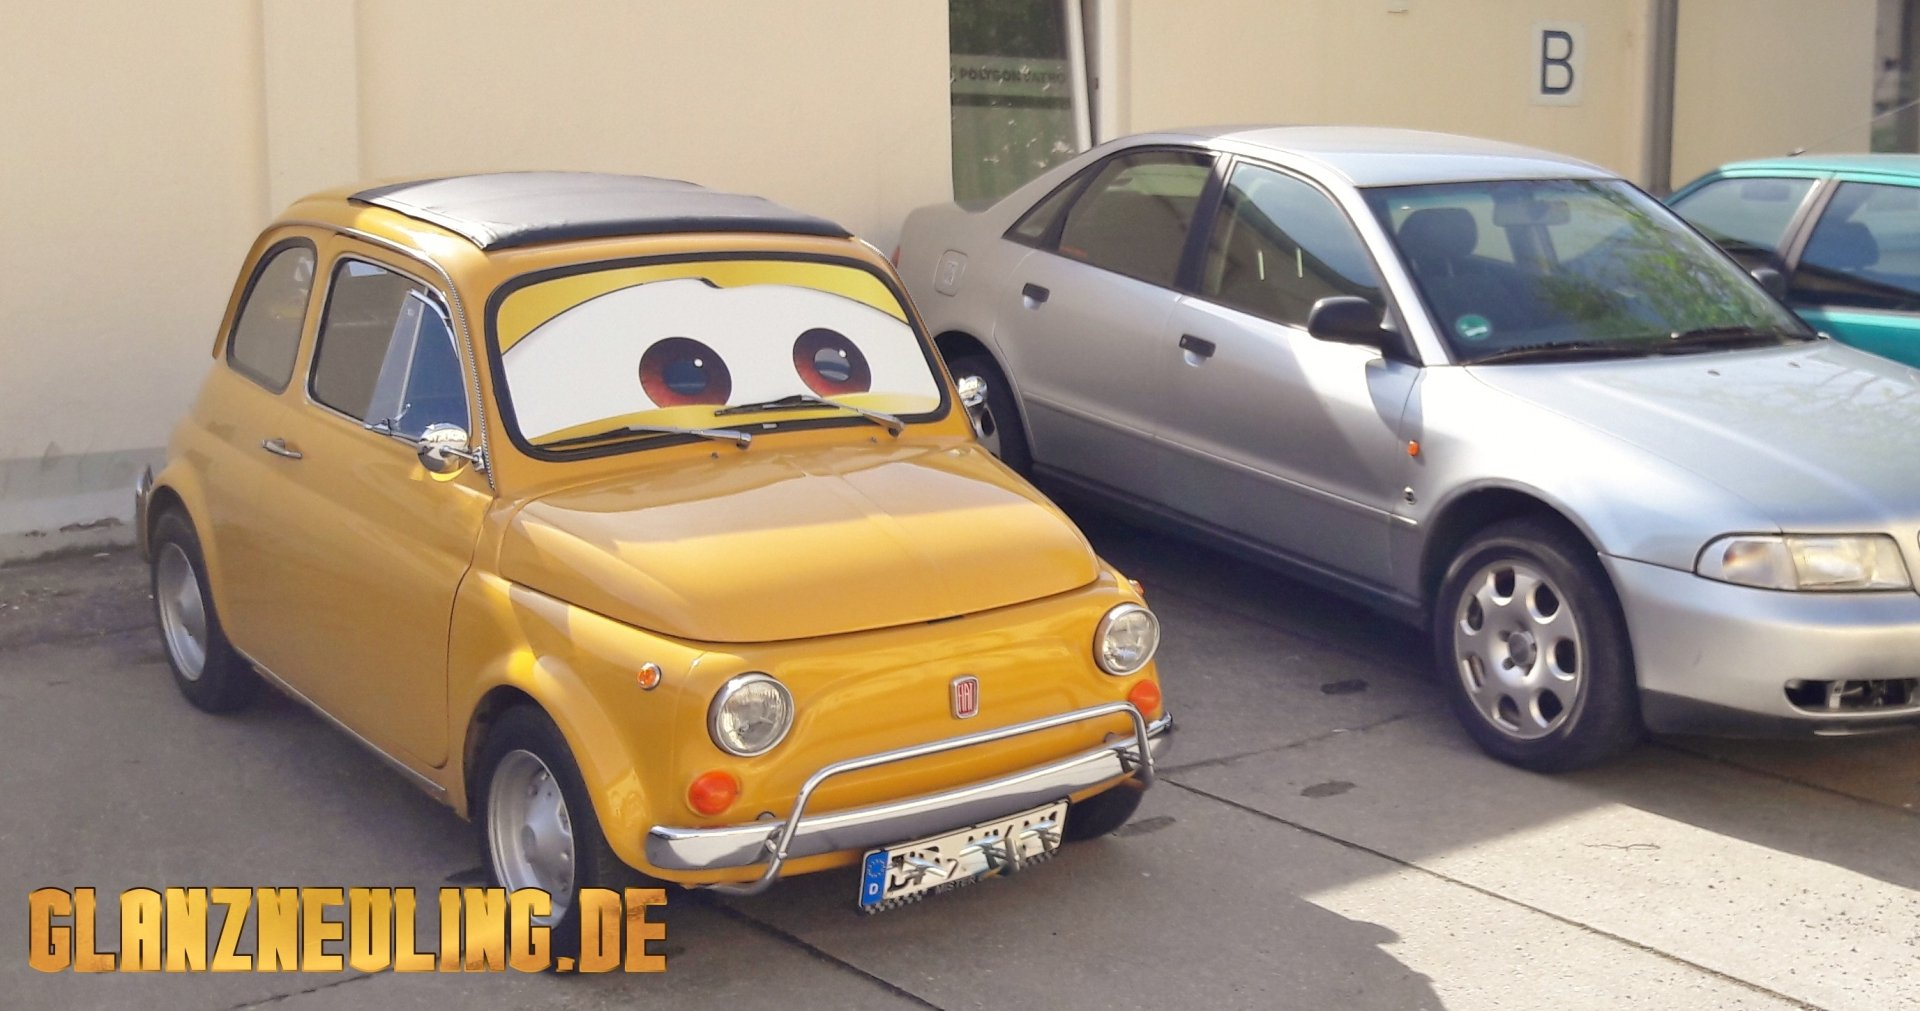 Süßes Auto Oldtimer gelb mieten Sachsen, Dresden, Berlin, BRandenburg Görlitz